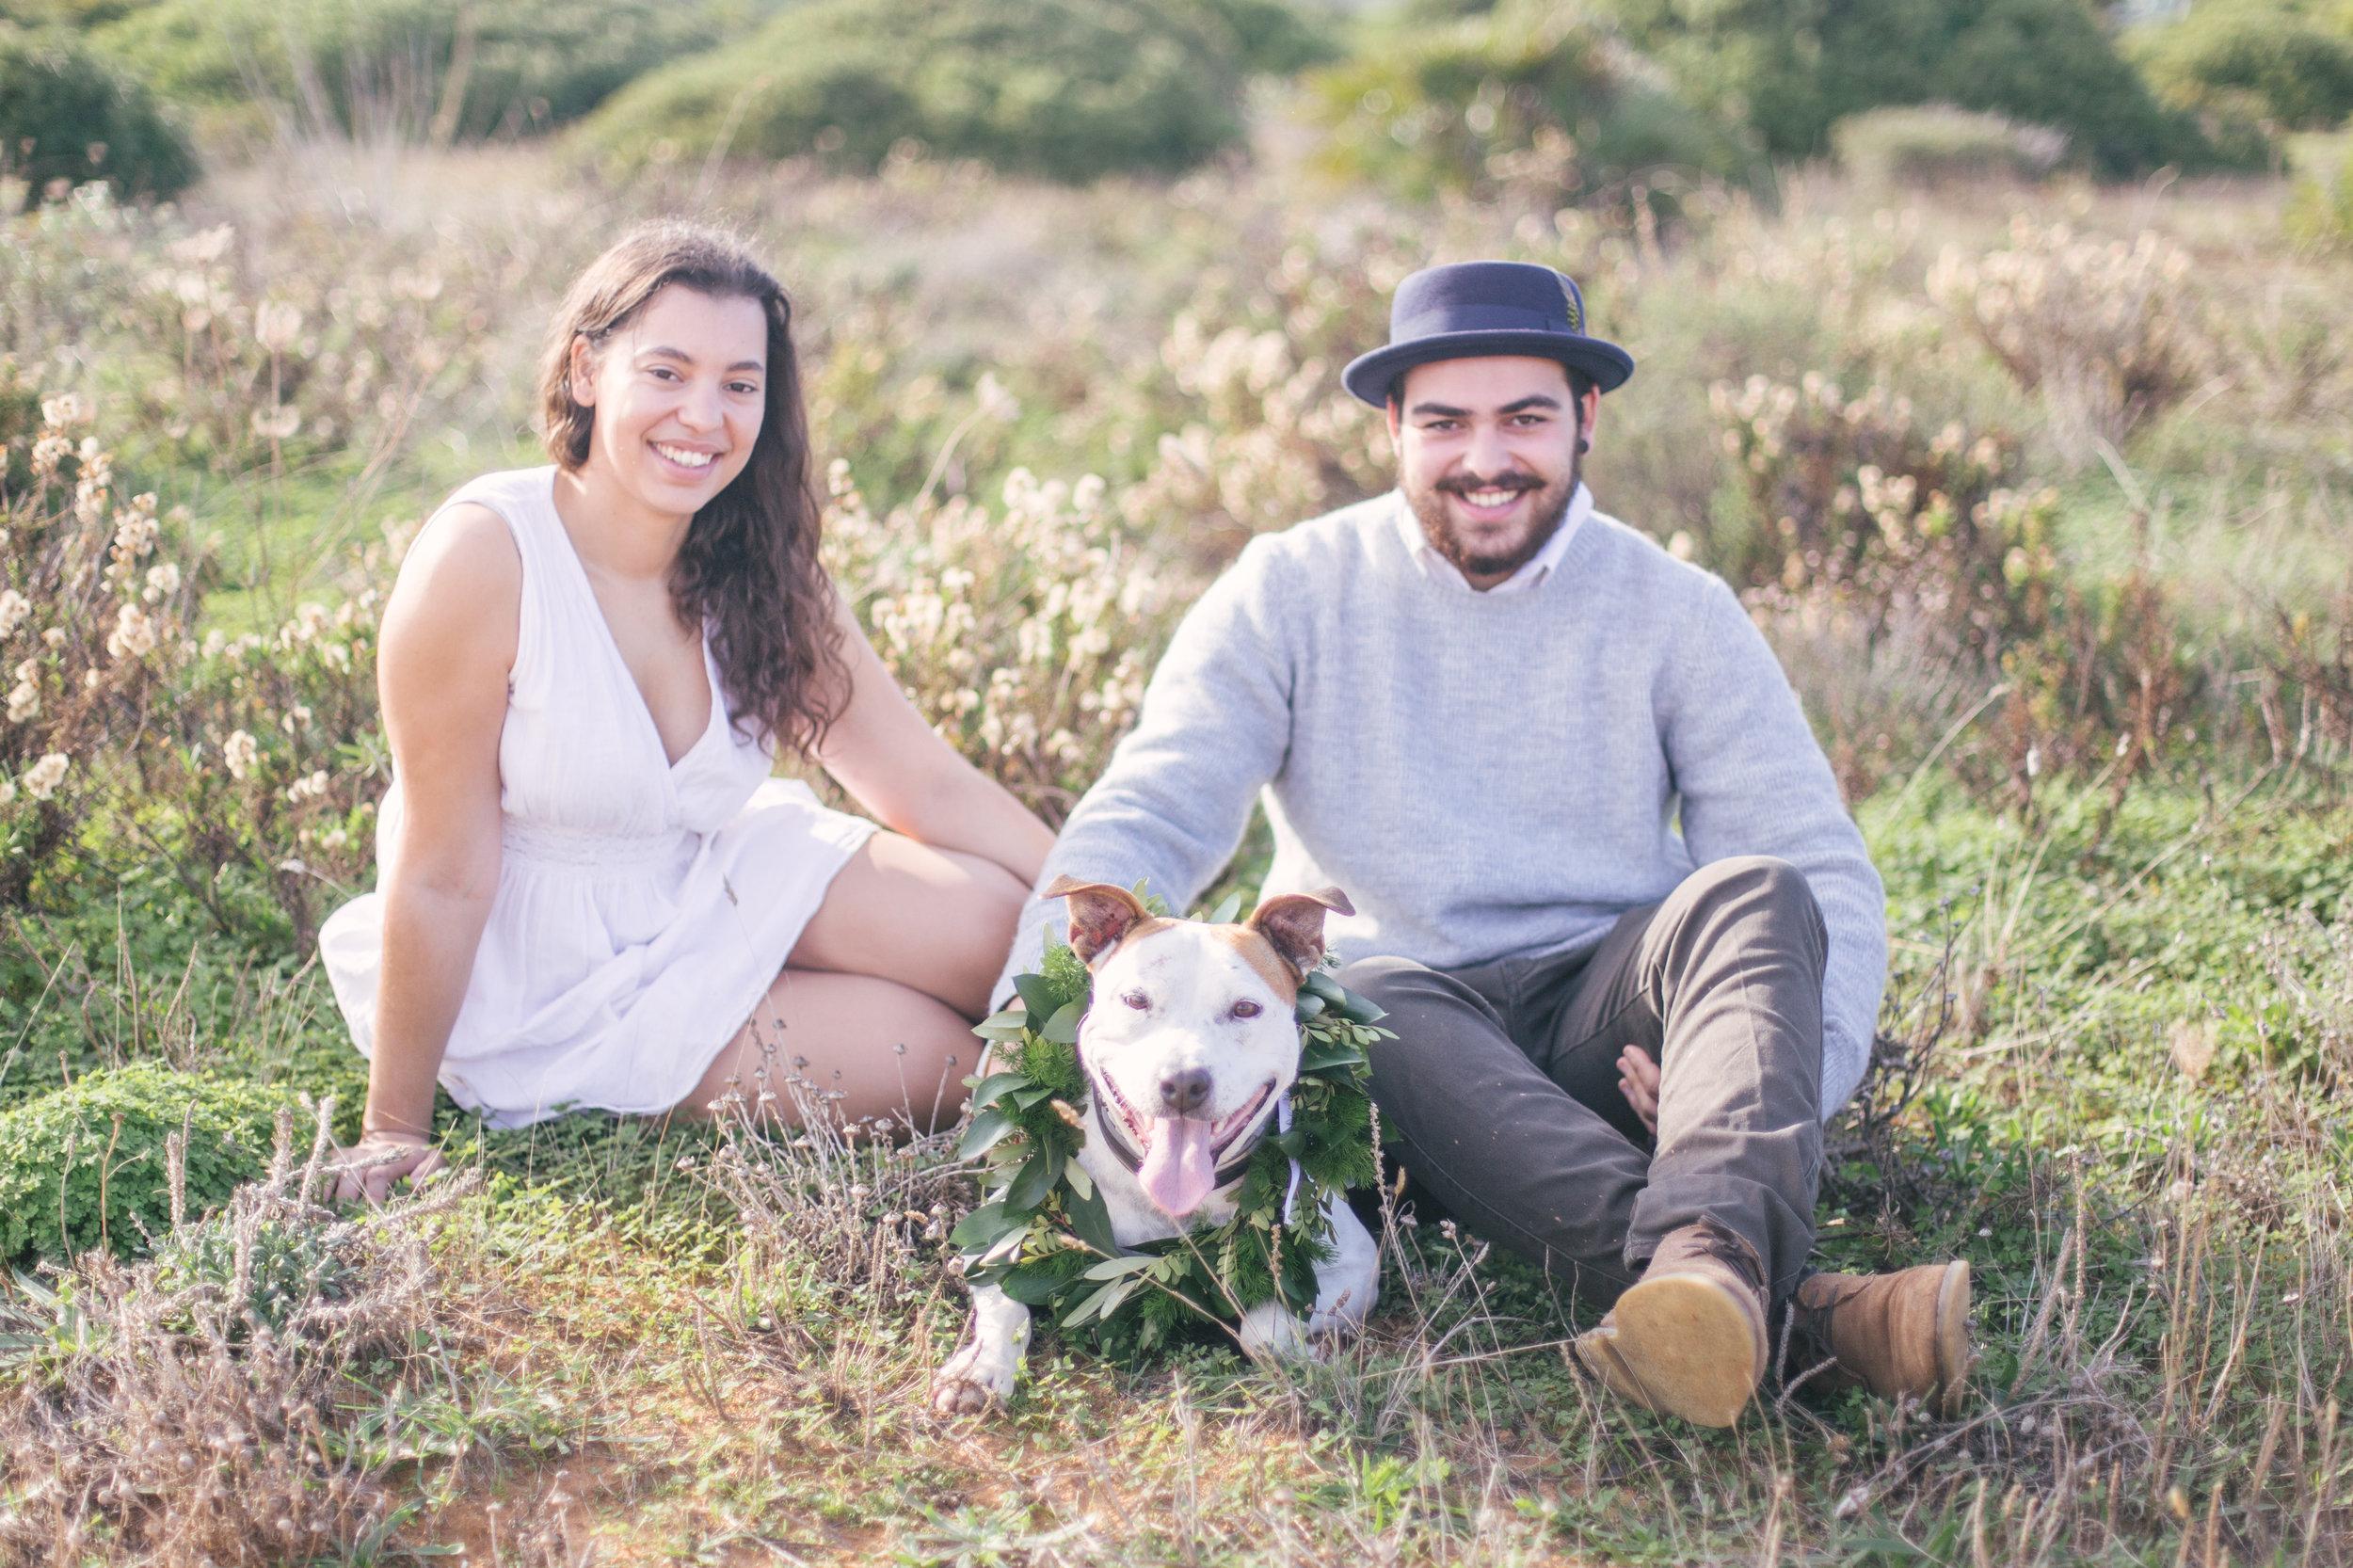 Sandra&Bernardo_v2_Nov13-45.jpg